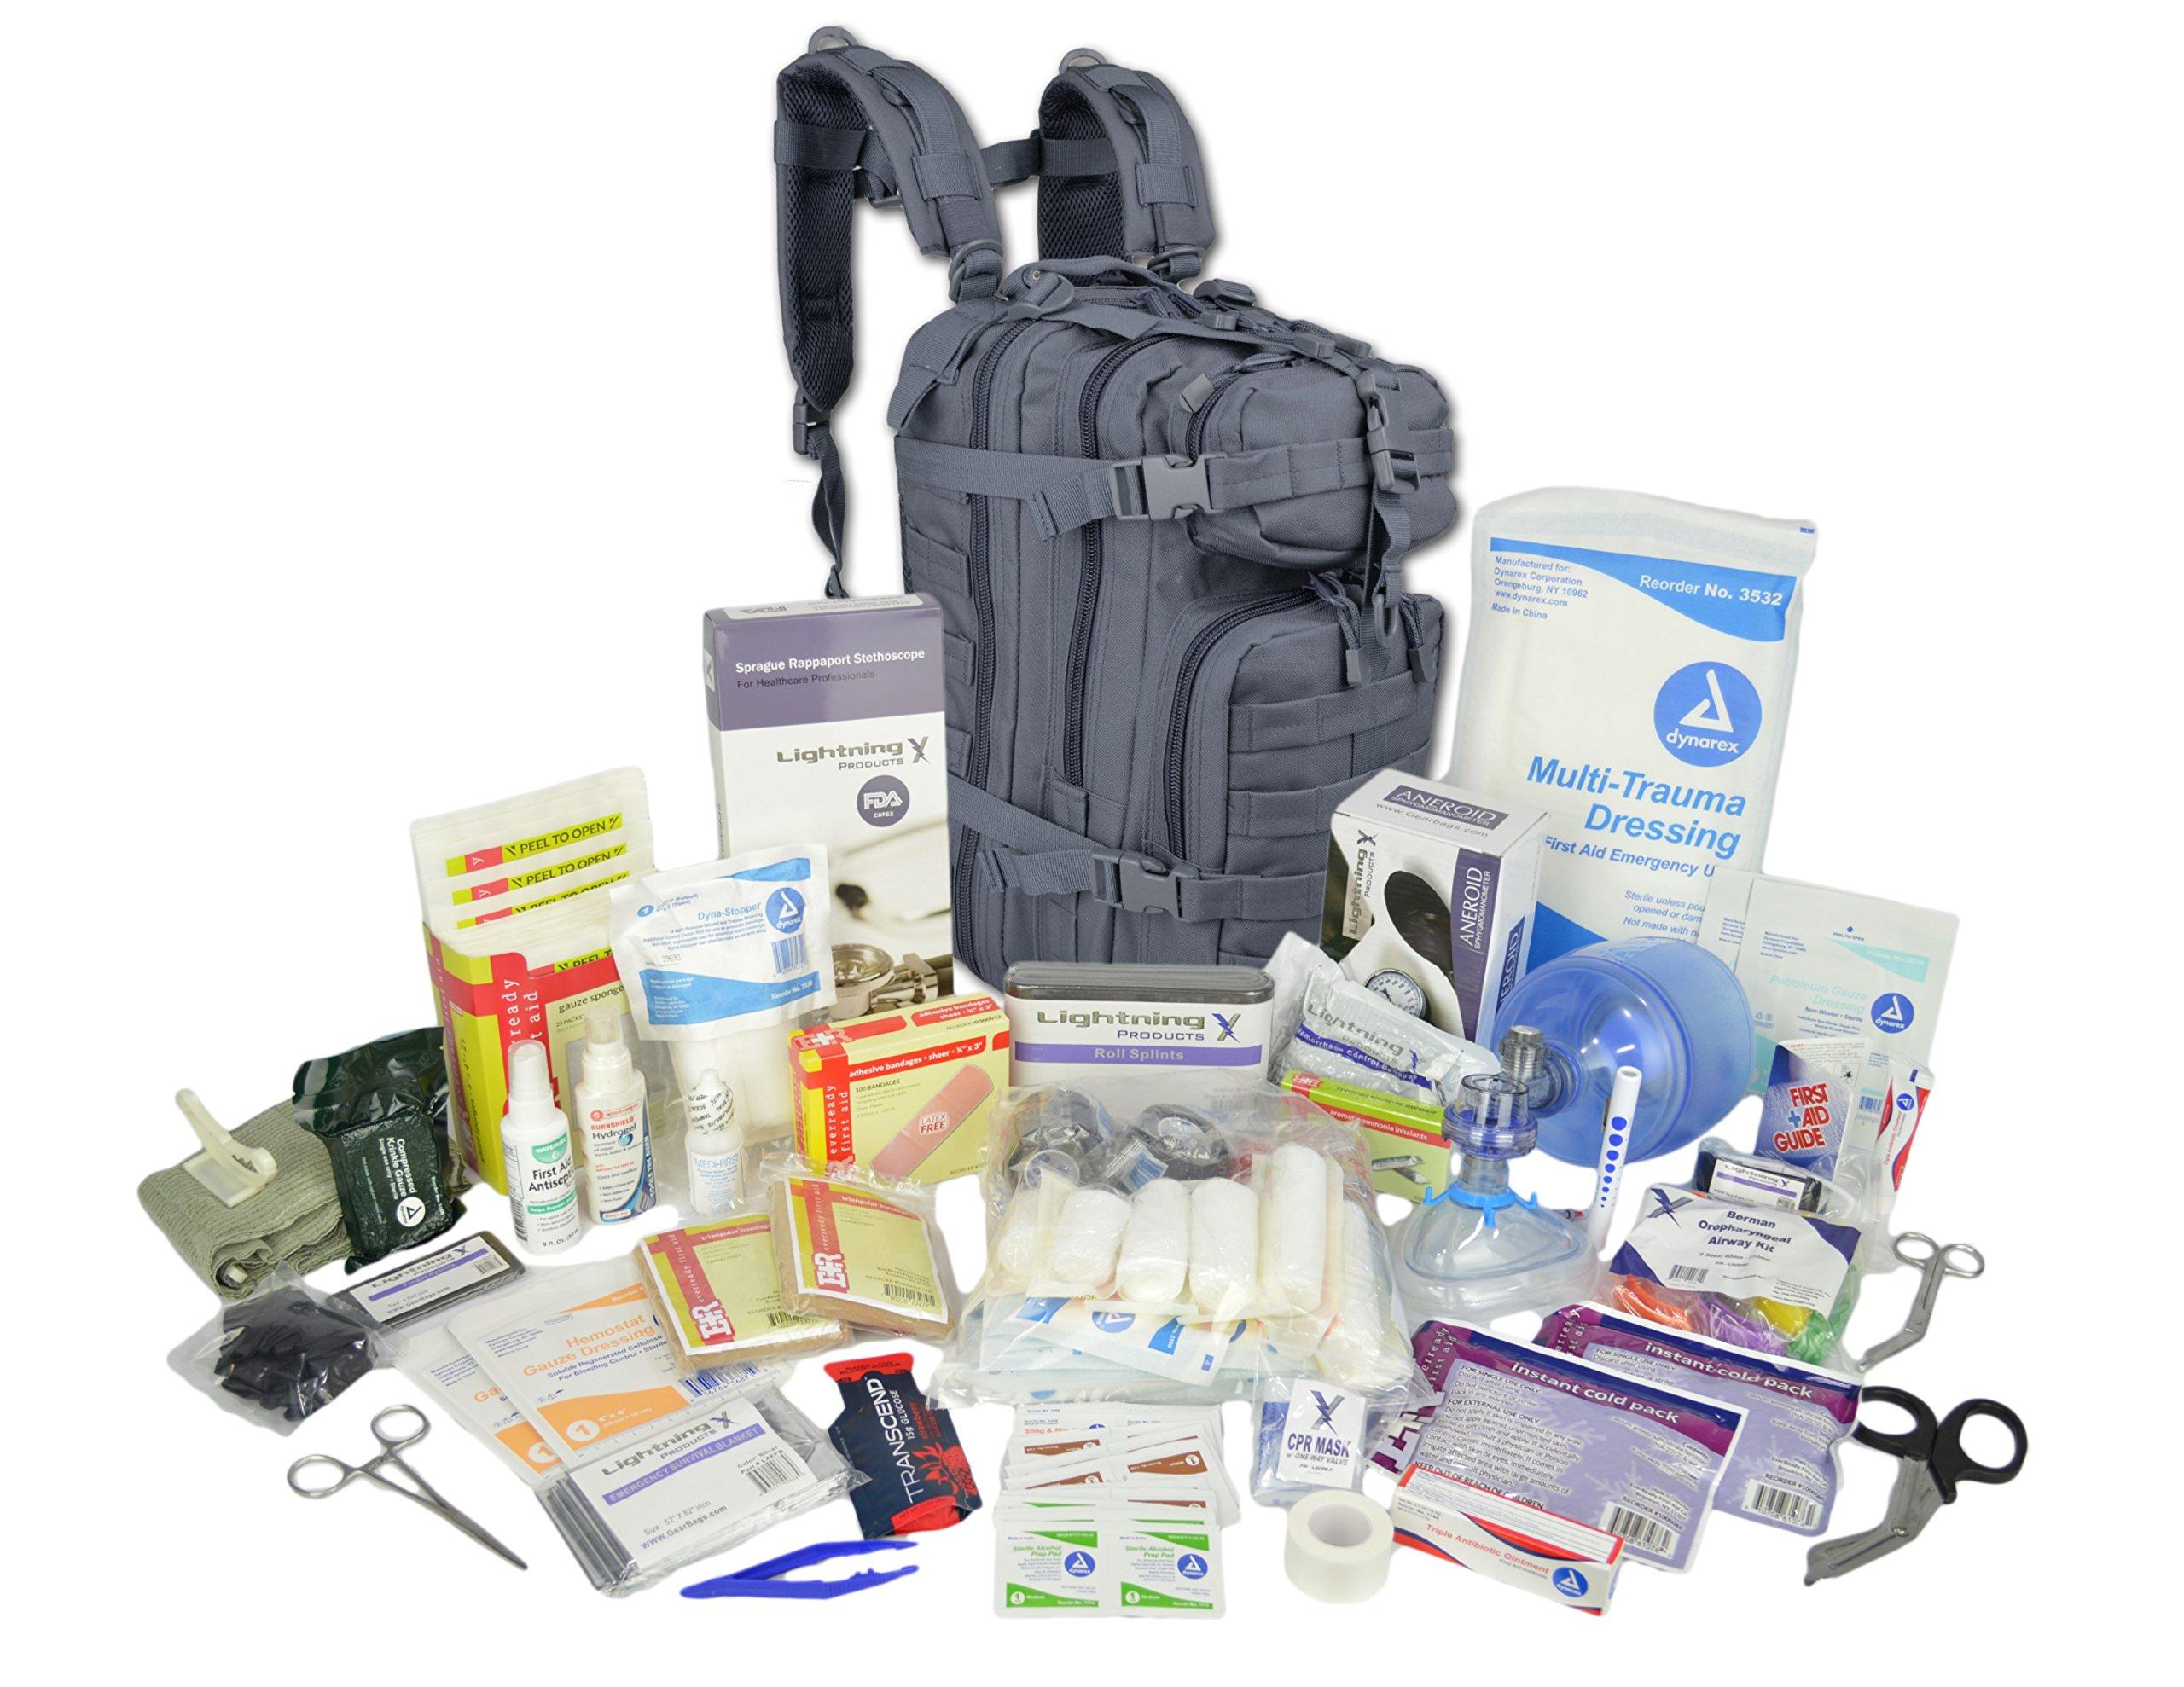 Lightning X Stocked EMS/EMT Trauma & Bleeding First Aid Responder Medical Backpack + Kit (Grey)